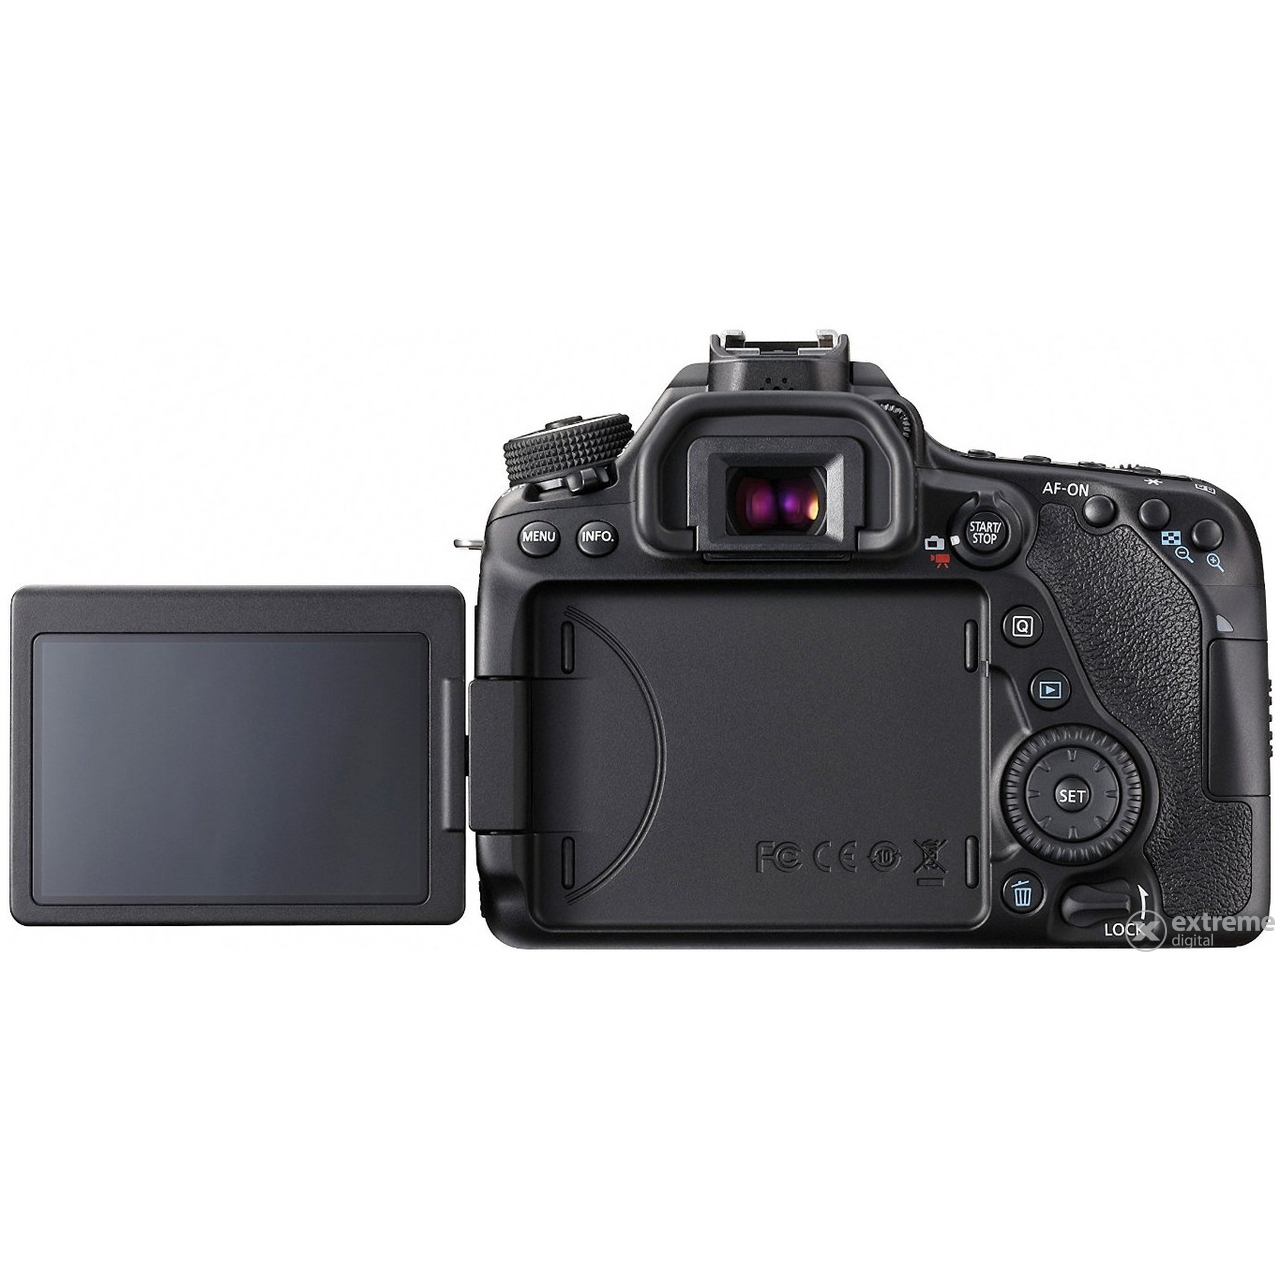 Canon Eos 80d Kamera Gehuse Extreme Digital Powershot G1 X Mark Ii Paket